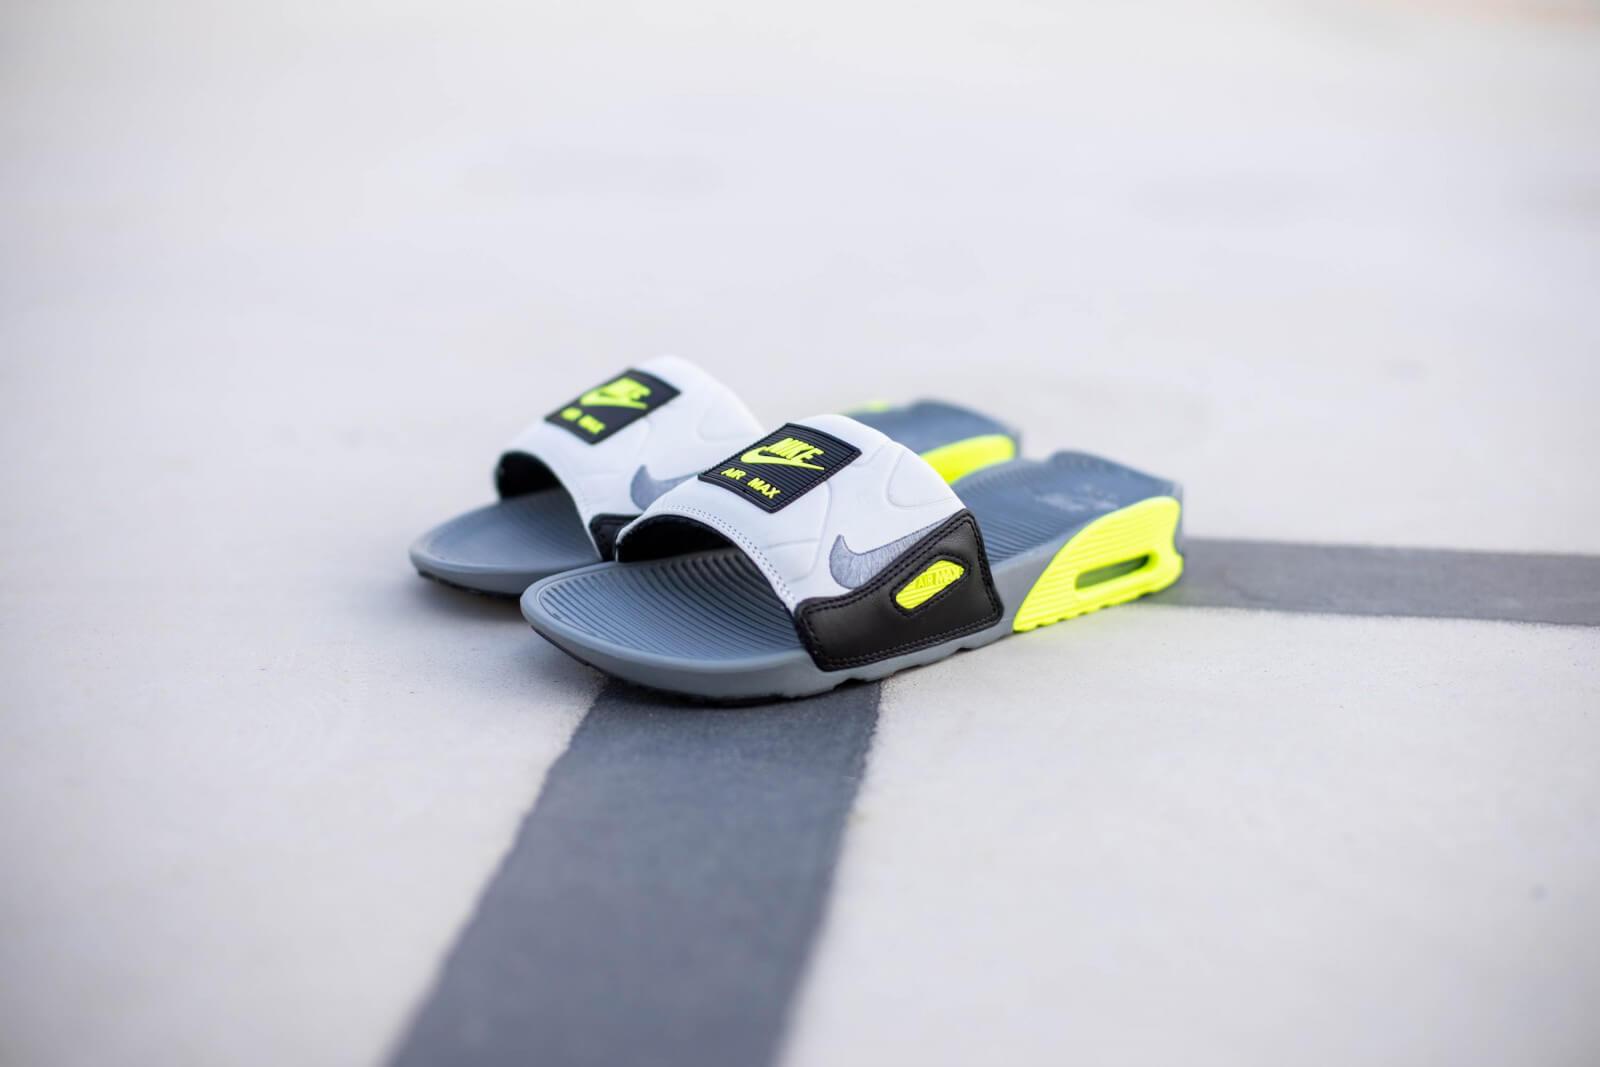 Nike Air Max 90 Slide Smoke Grey/Volt-Black - BQ4635-001